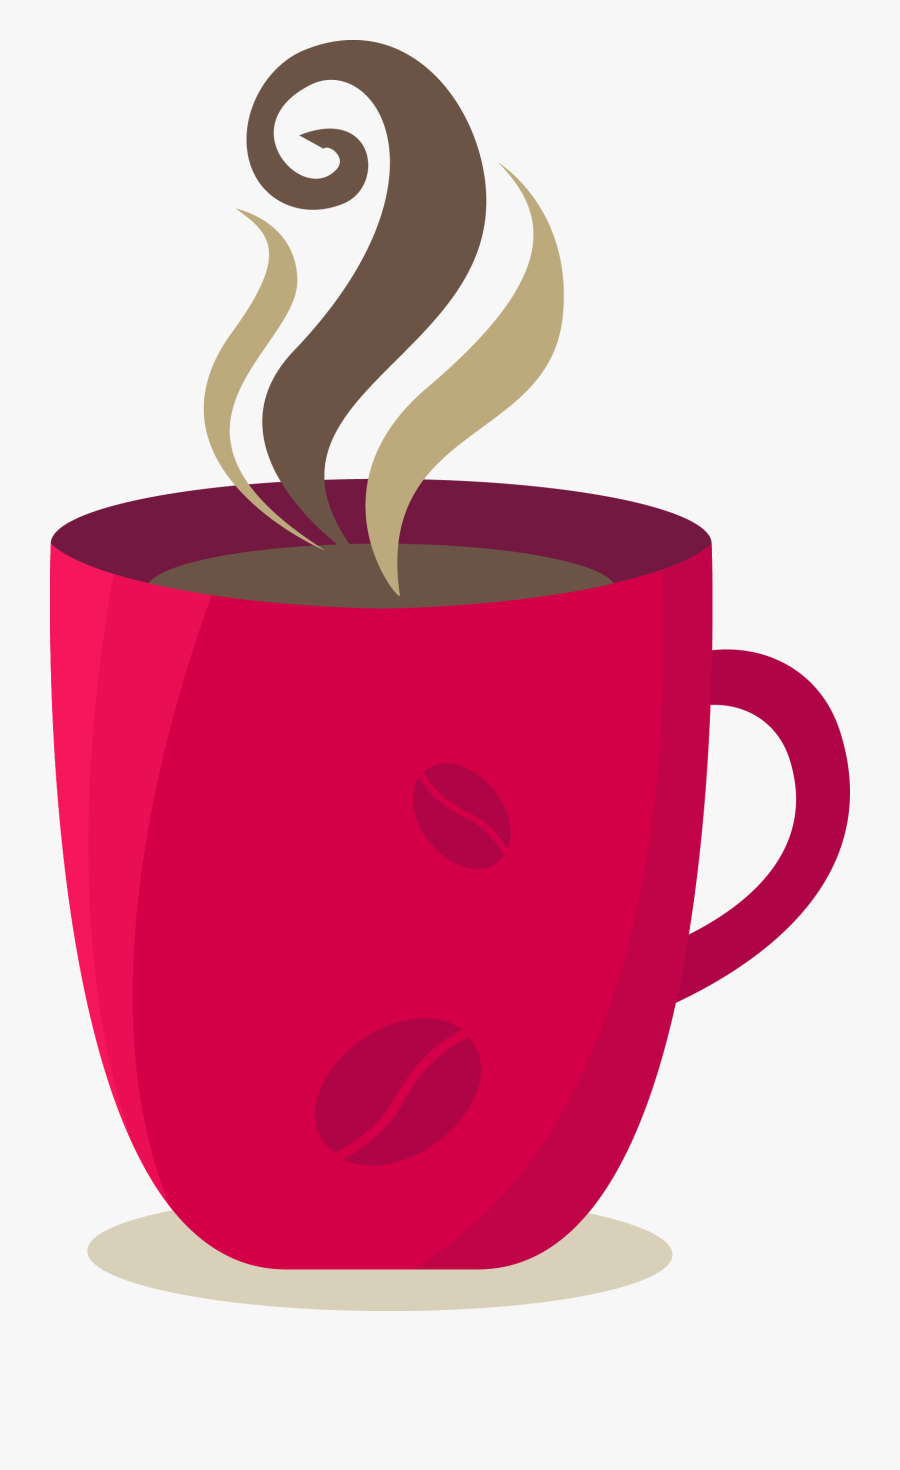 Clip Art Cartoon Coffee Mugs - Coffee Cup Images Cartoon, Transparent Clipart